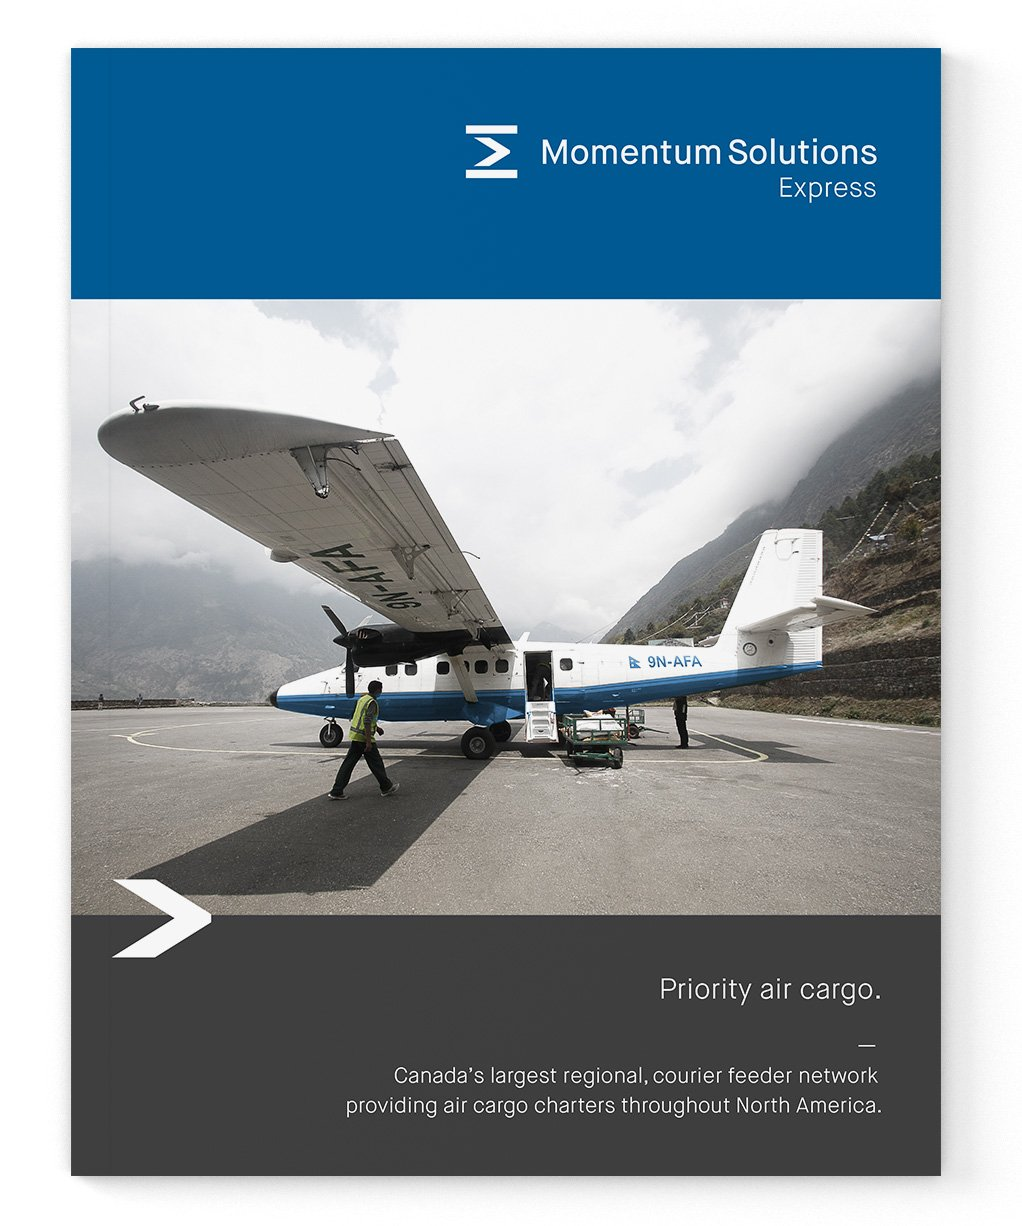 Express air cargo branding booklet design